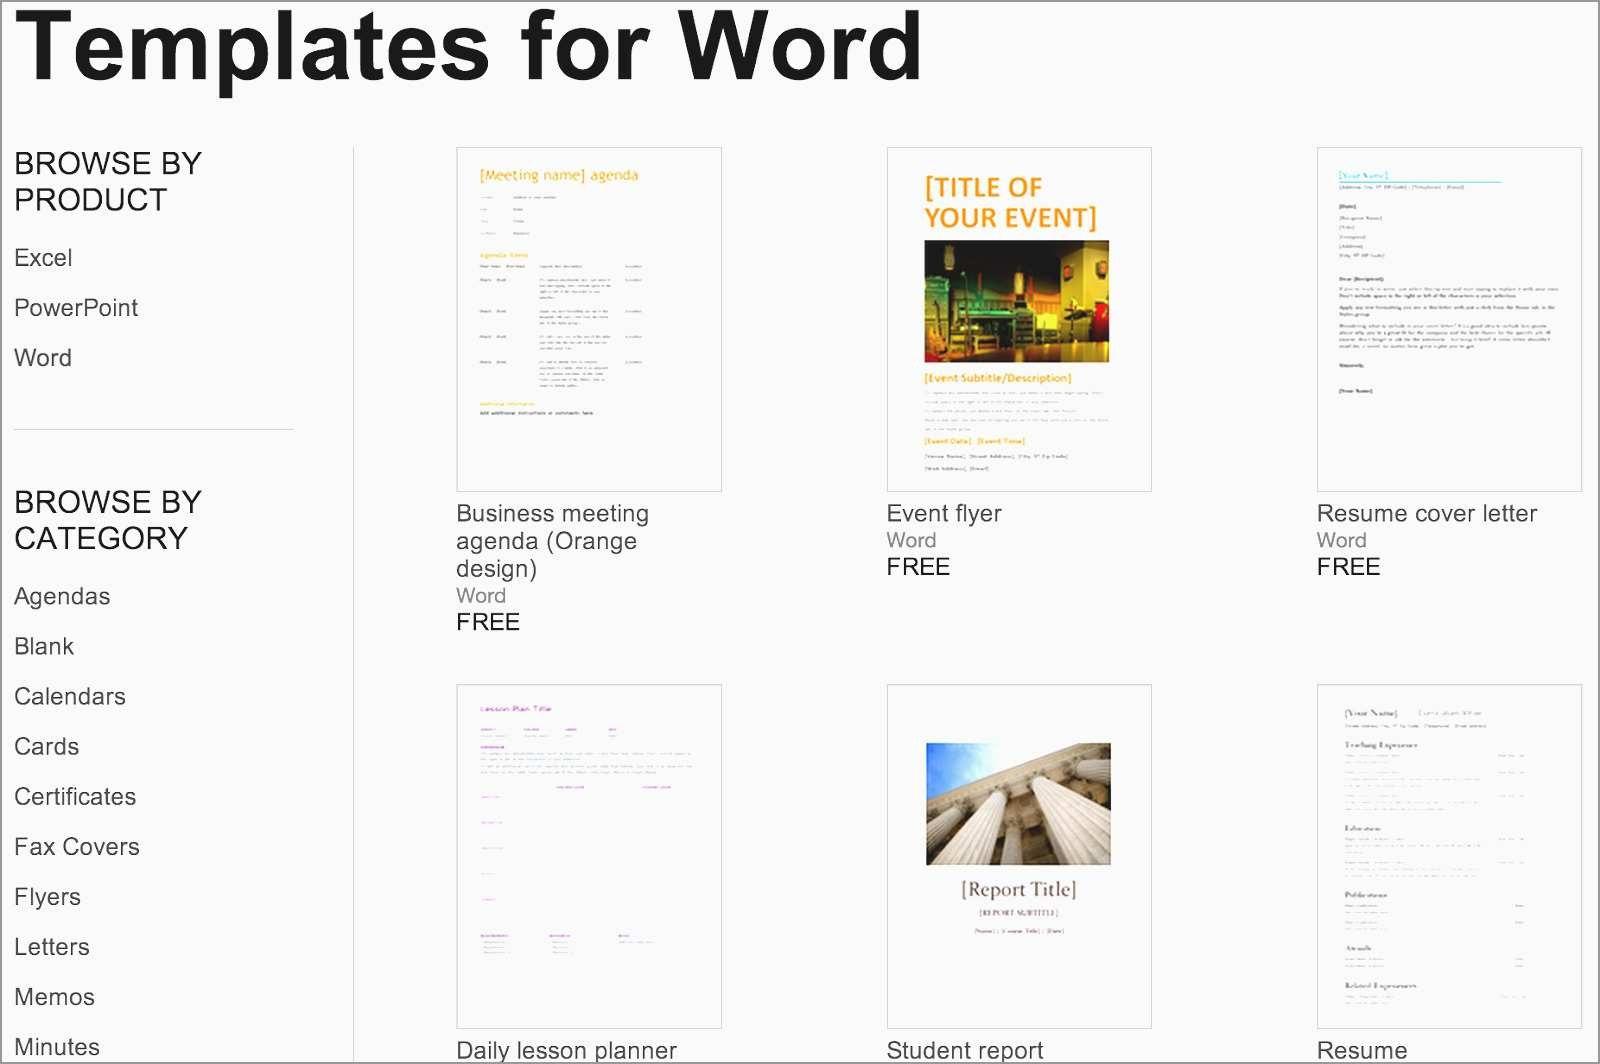 Fresh Poster Template Free Microsoft Word  Best Of Template For Free Business Flyer Templates For Microsoft Word